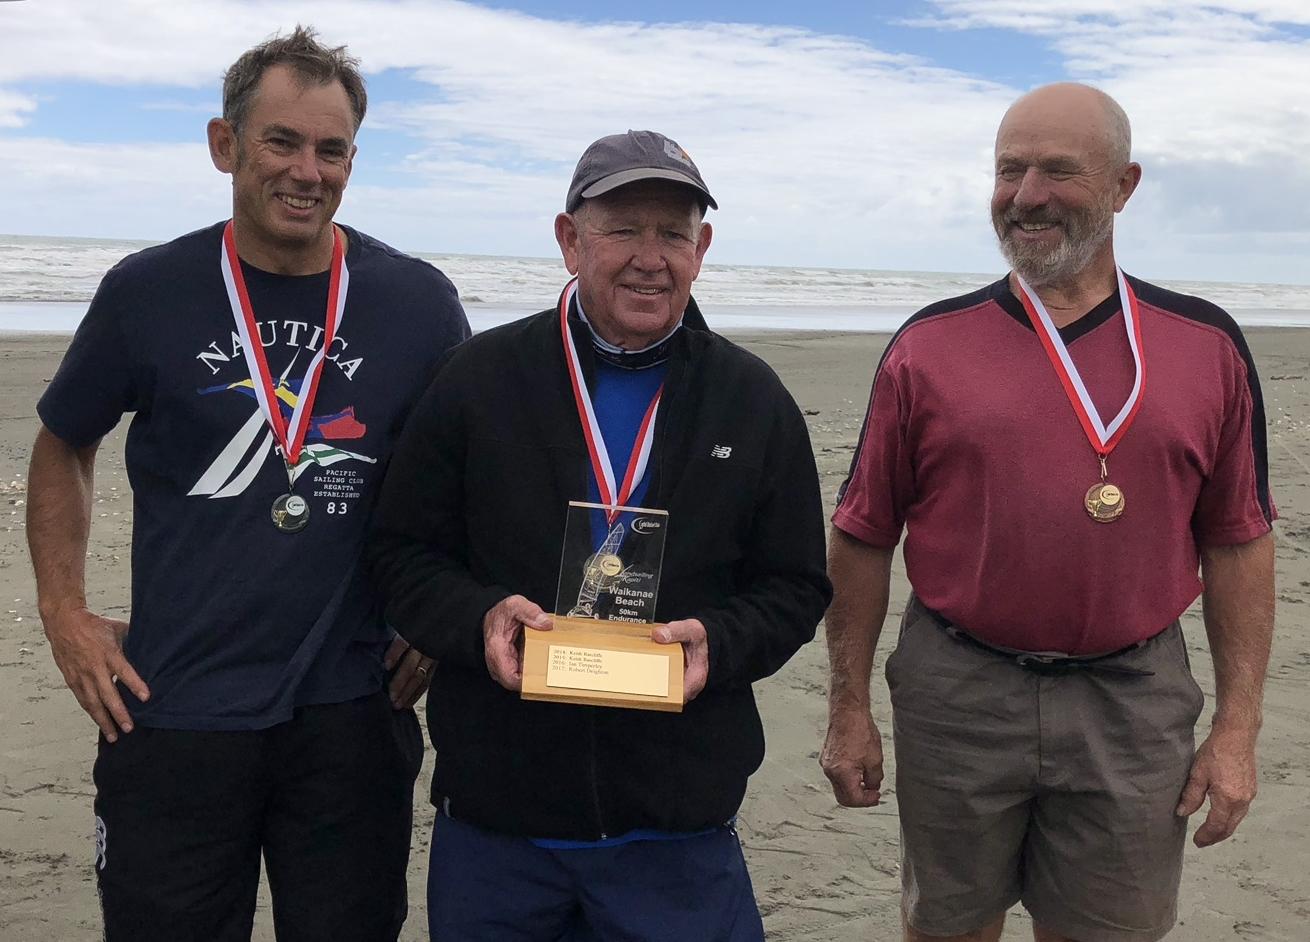 Marathon Winners!